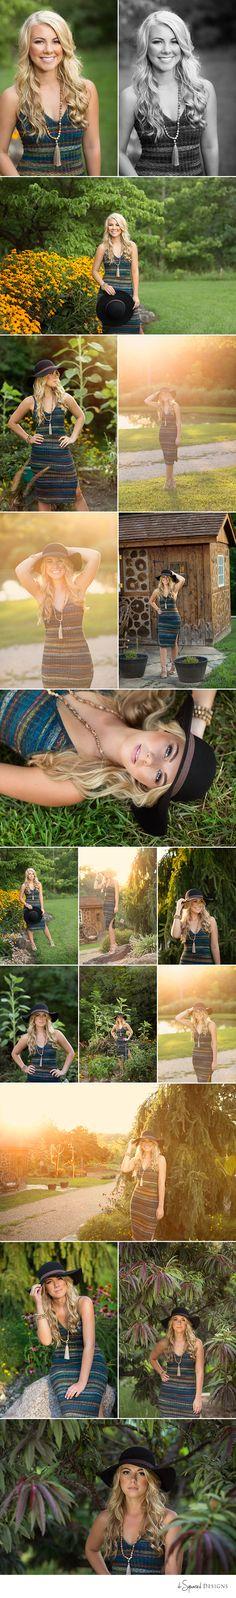 d-Squared Designs St. Louis, MO Senior Photography. Senior girl summer session…